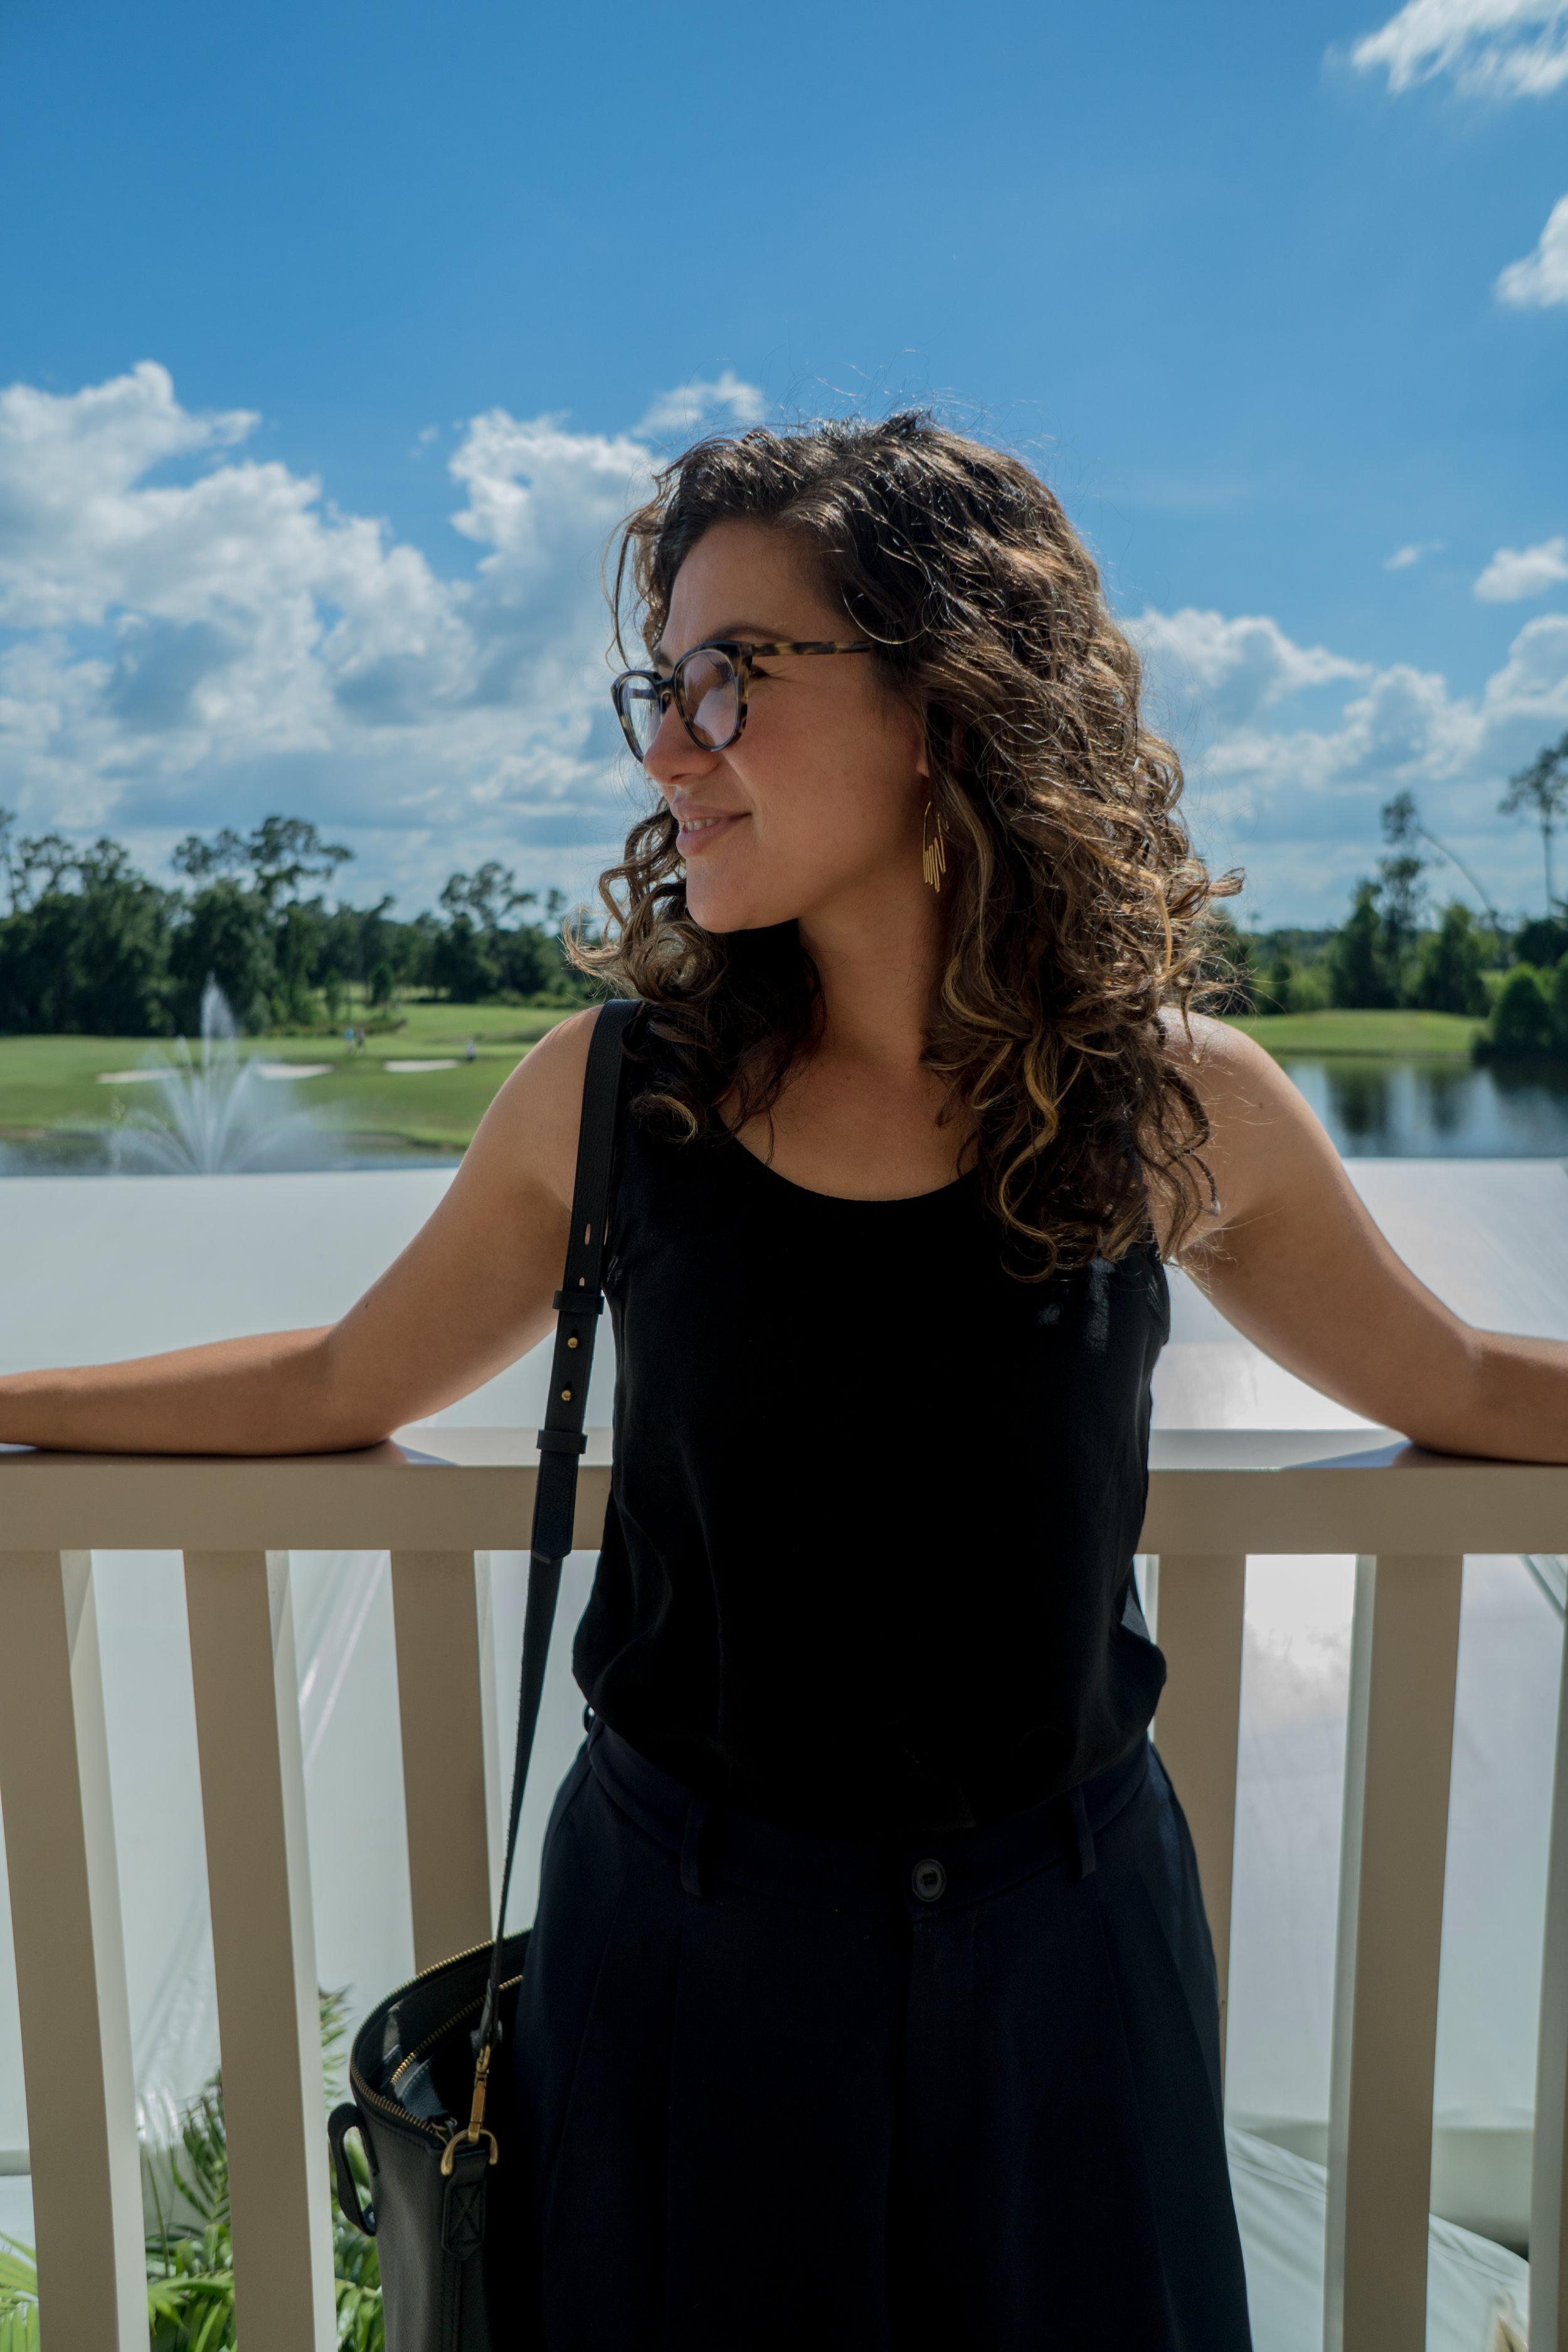 Cristina Cleveland photographed by Hallease Narvaez @ #BlogHer17